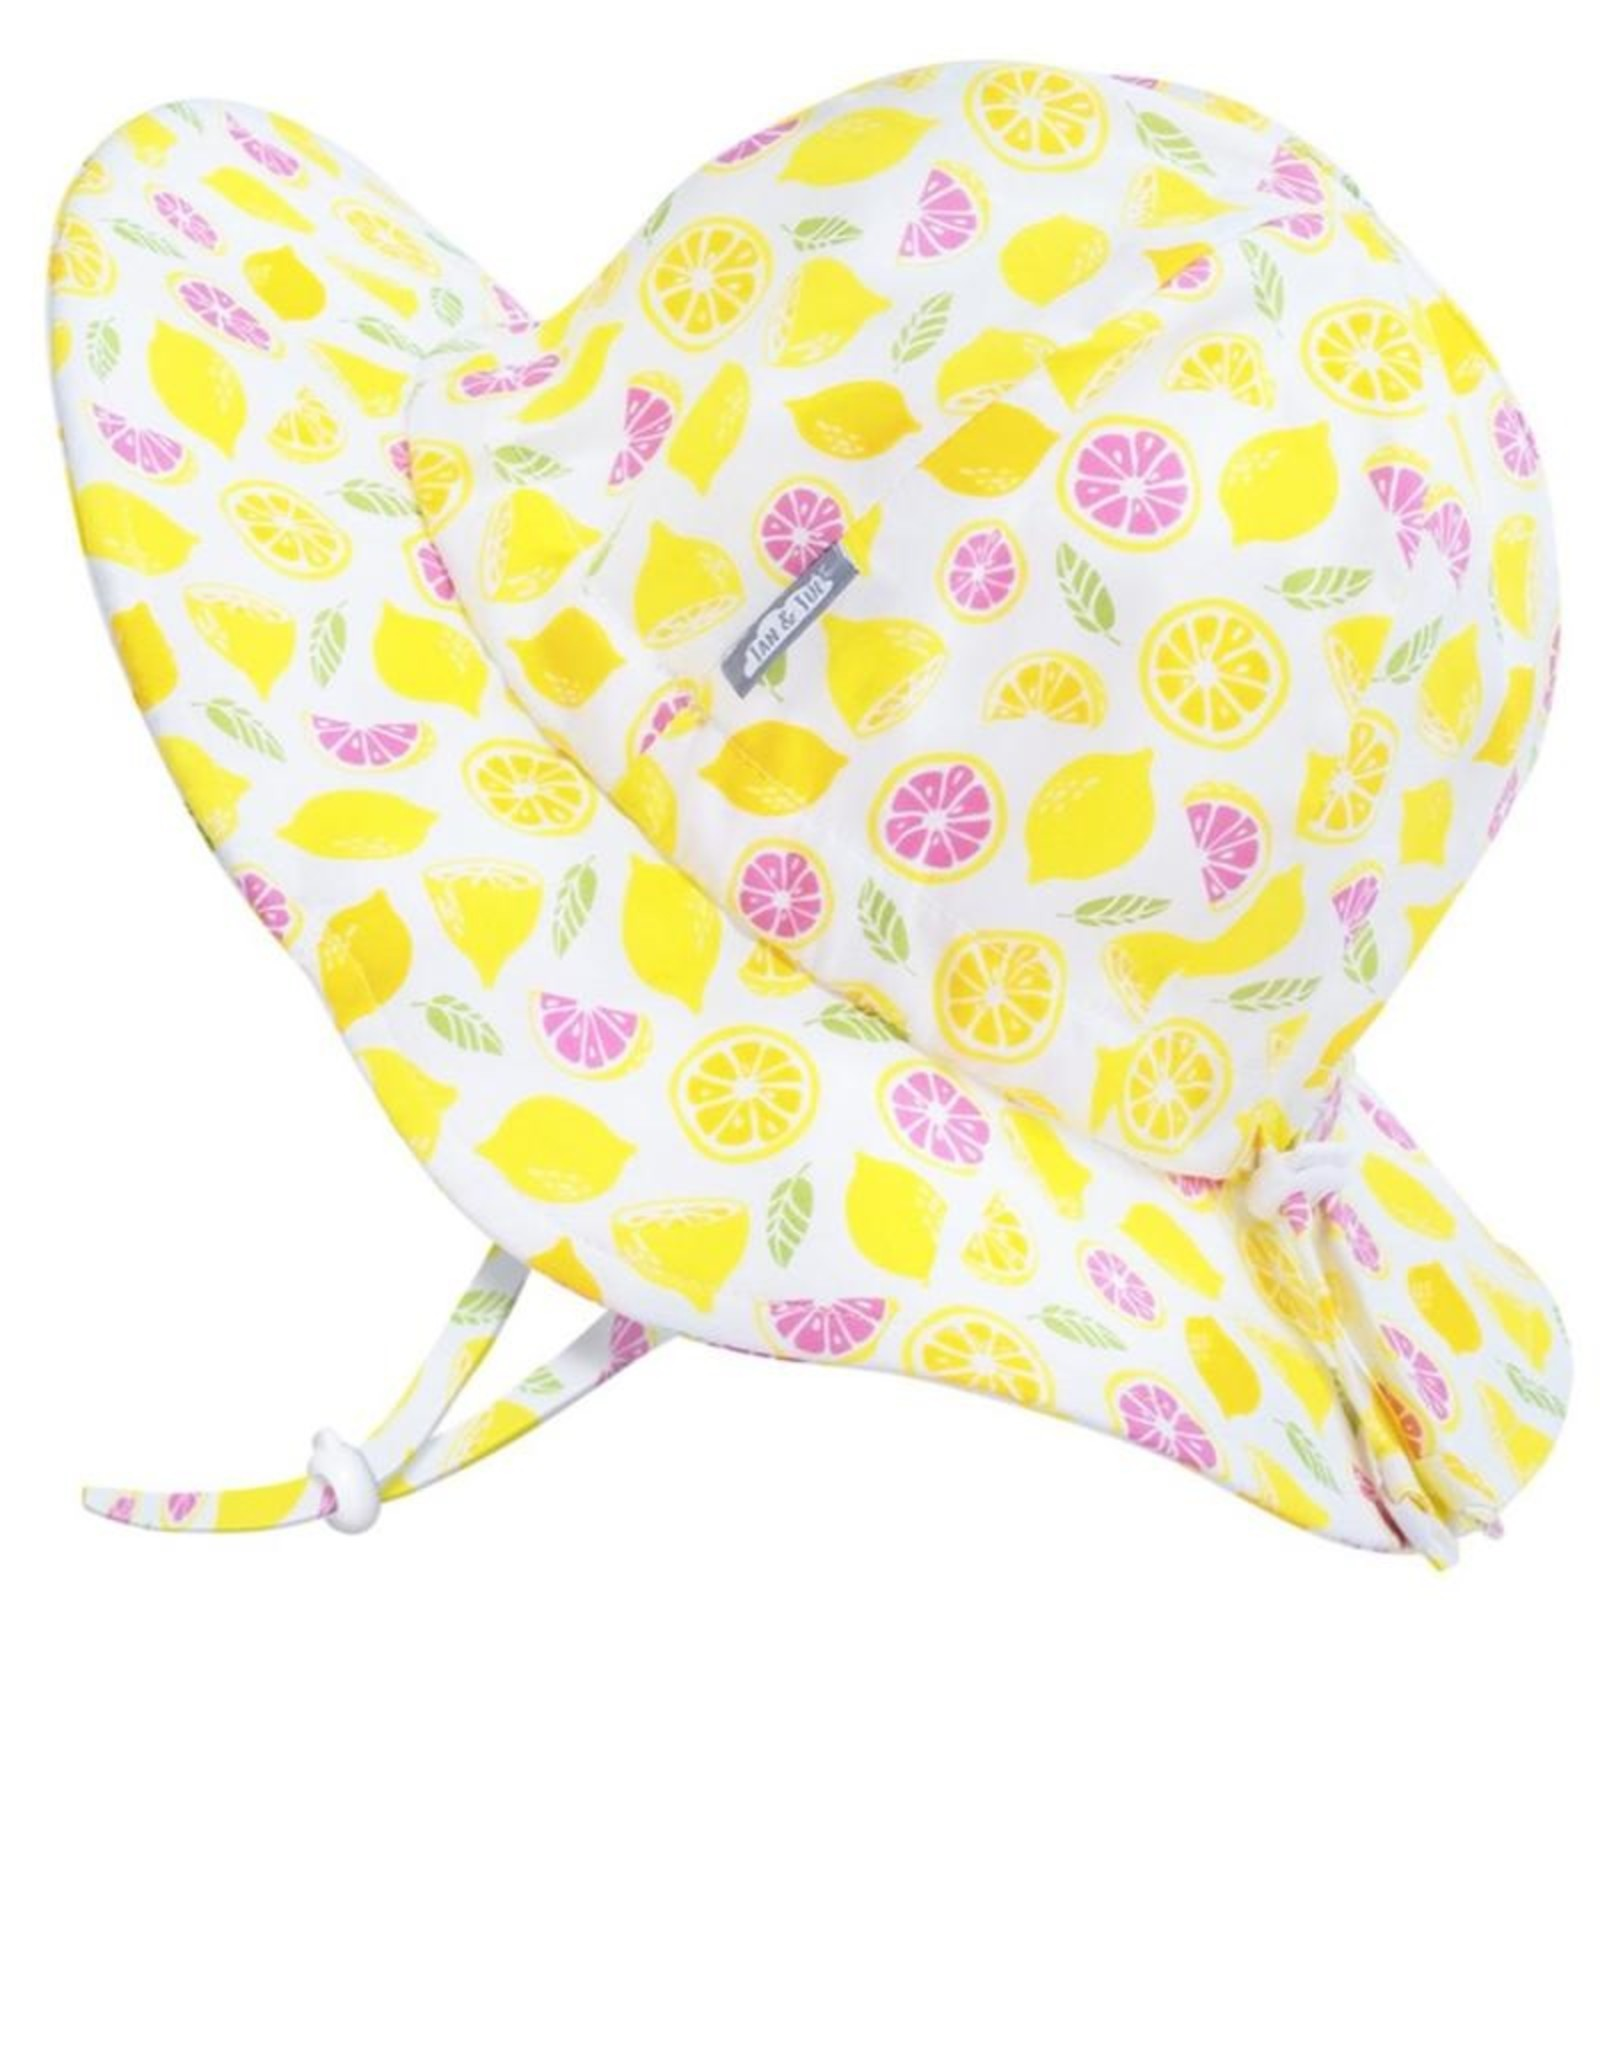 Jan & Jul Girl's Kids' Gro-With-Me® Cotton Floppy Hat